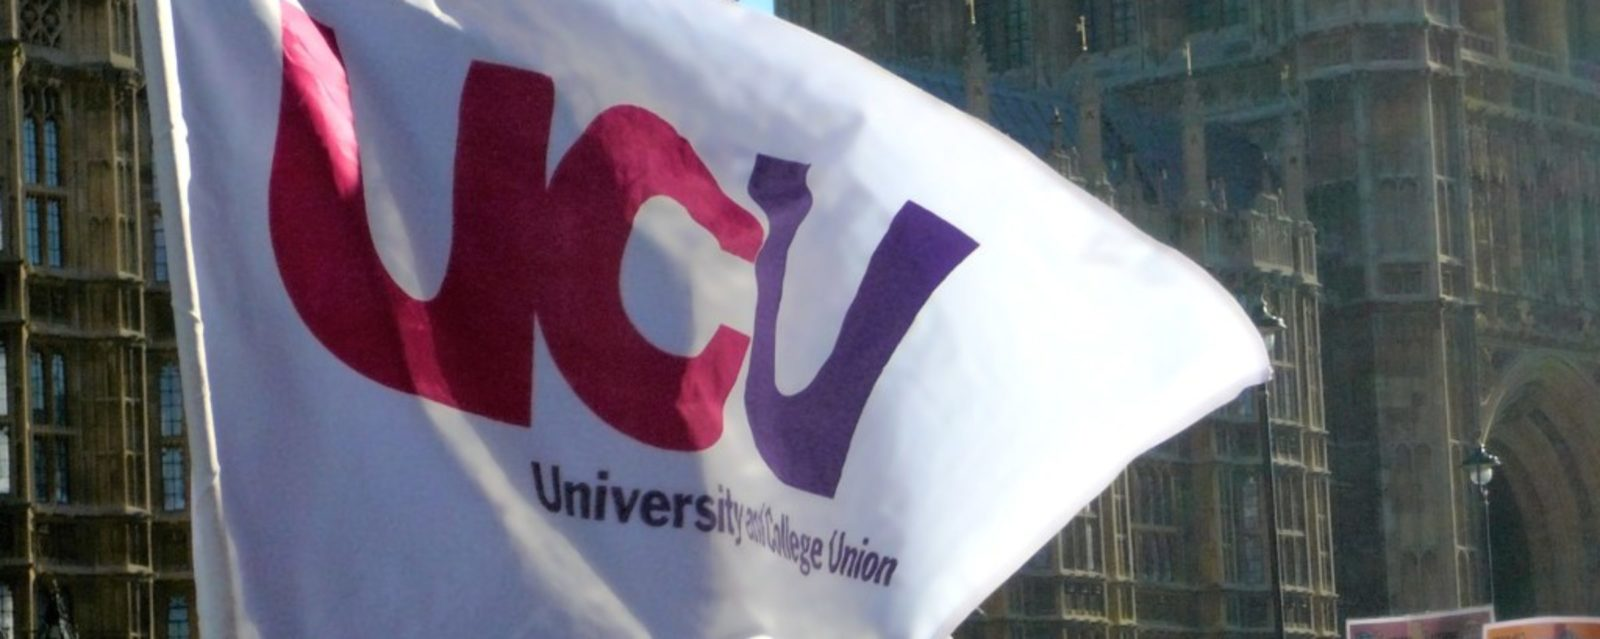 UCU Logo on a flag